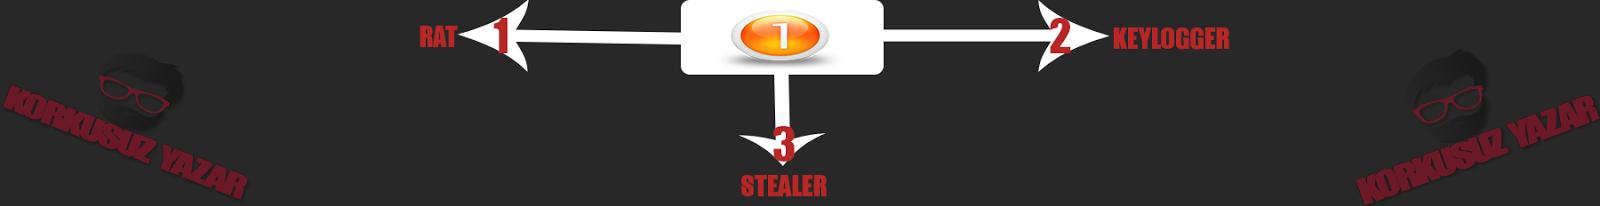 RAT - KEYLOGGER - STEALER